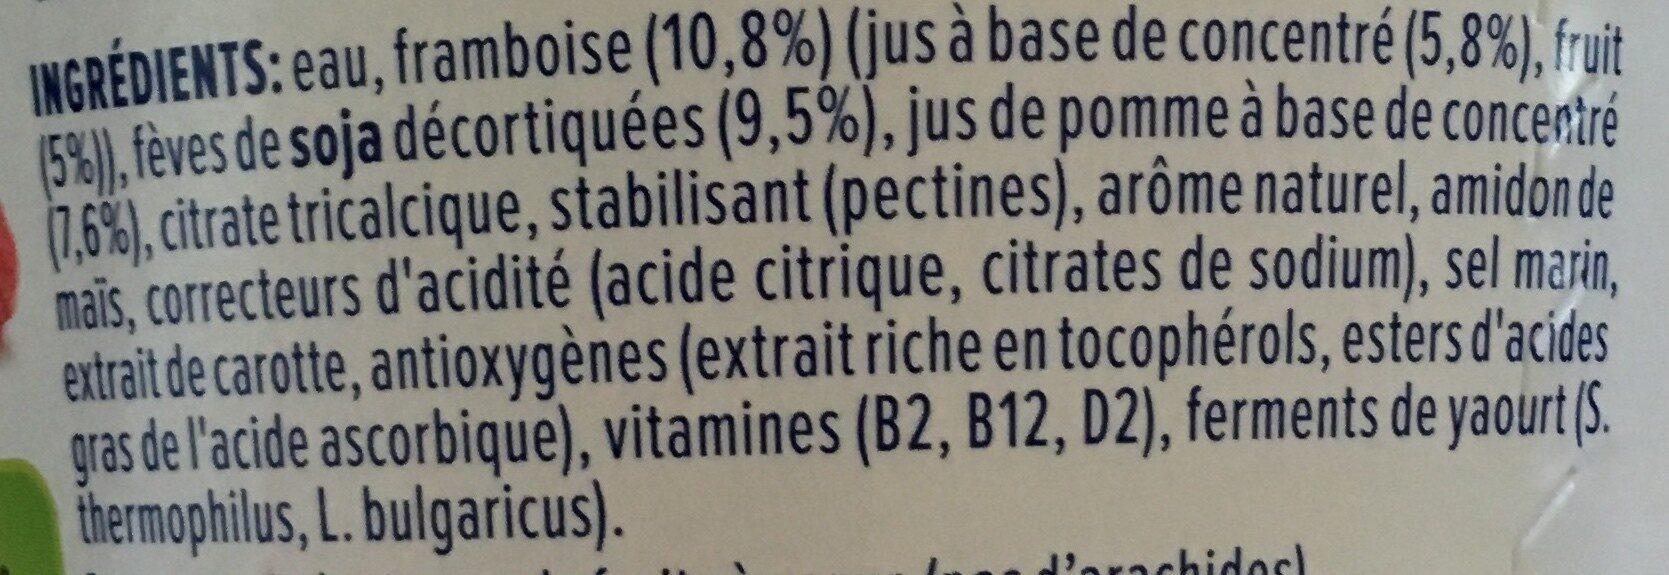 Framboise - Pomme - Ingrédients